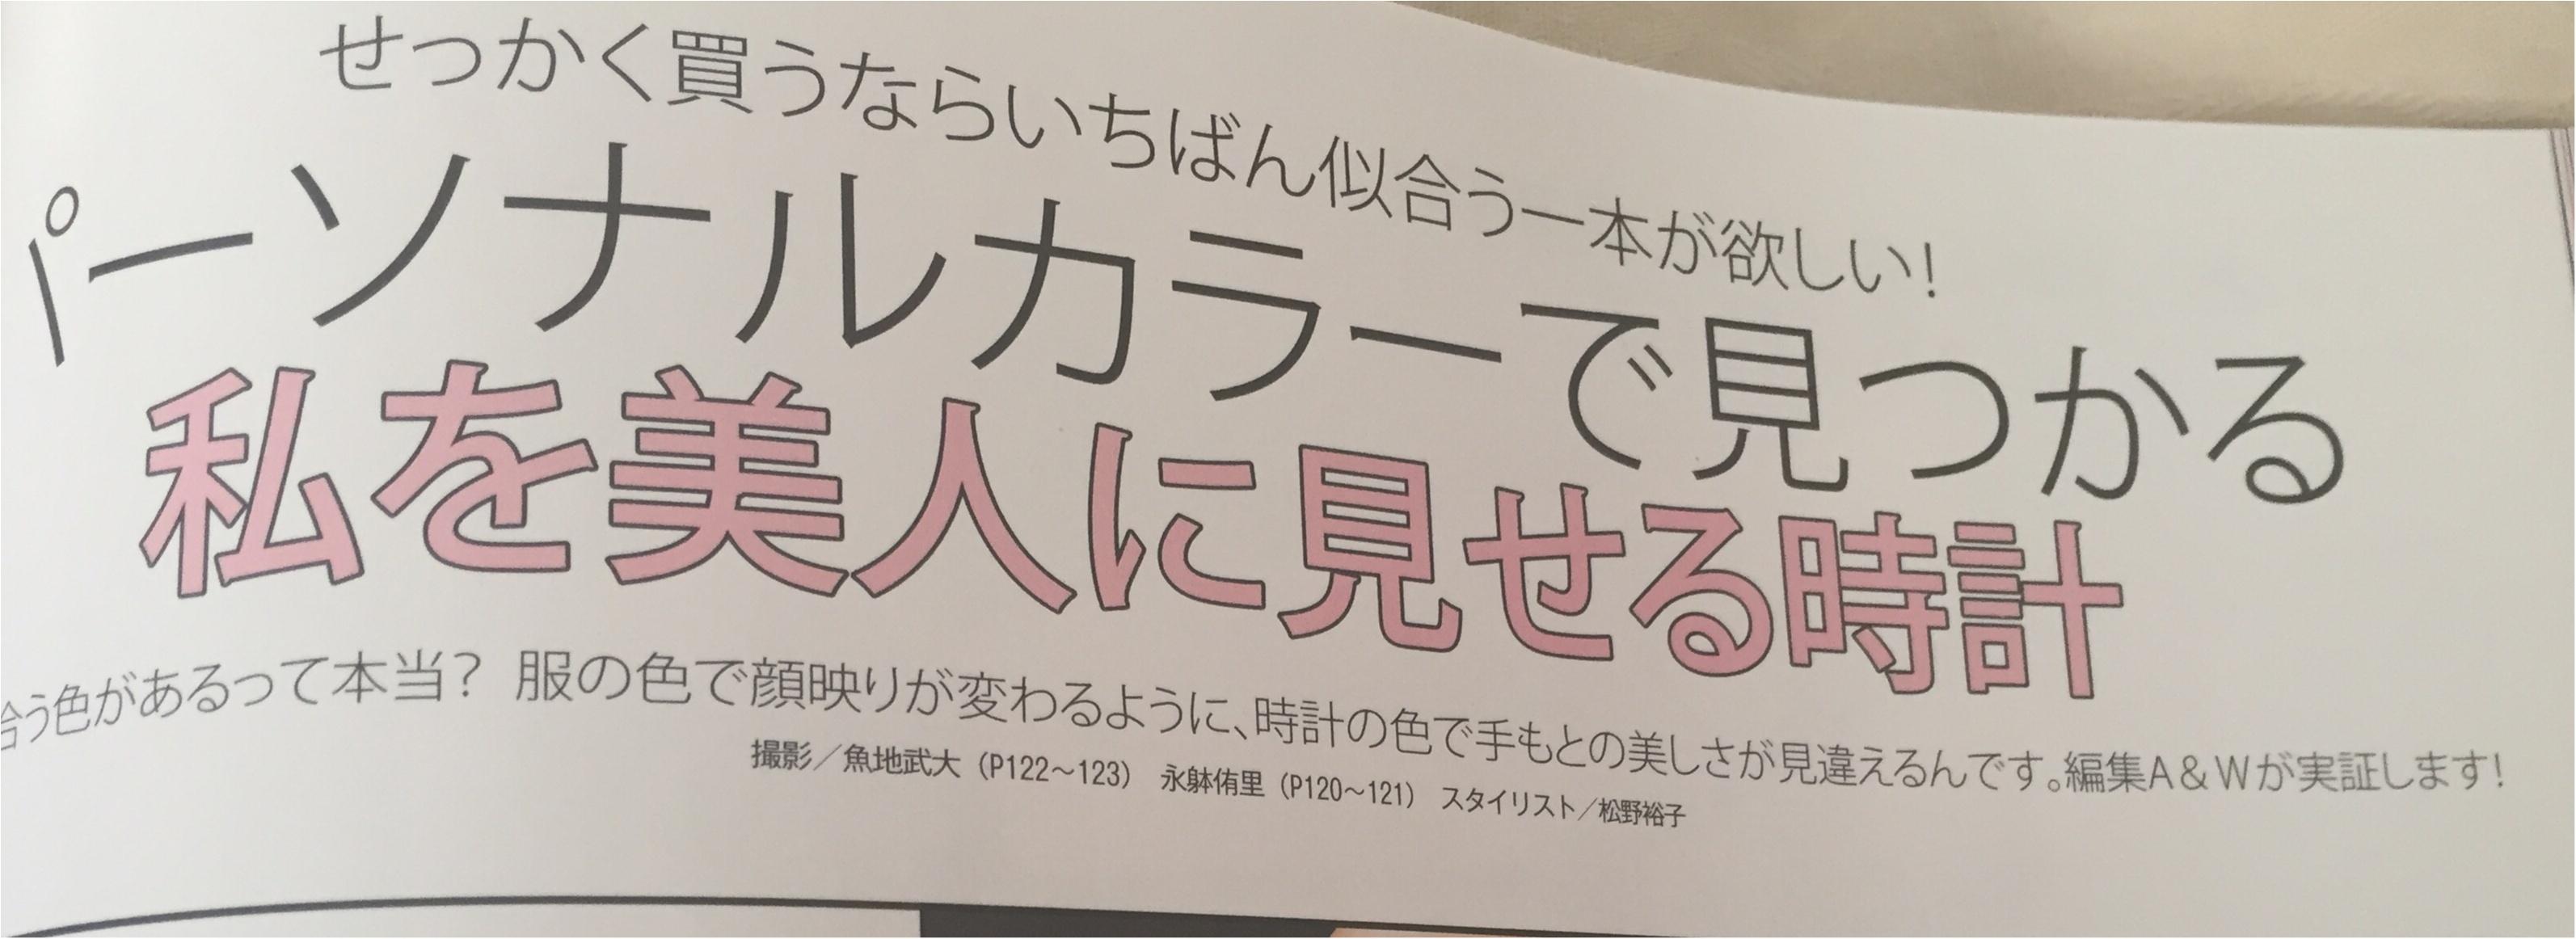 【MORE12月号☆発売中】特別付録はCOACHステーショナリー4点セット✨≪samenyan≫_9